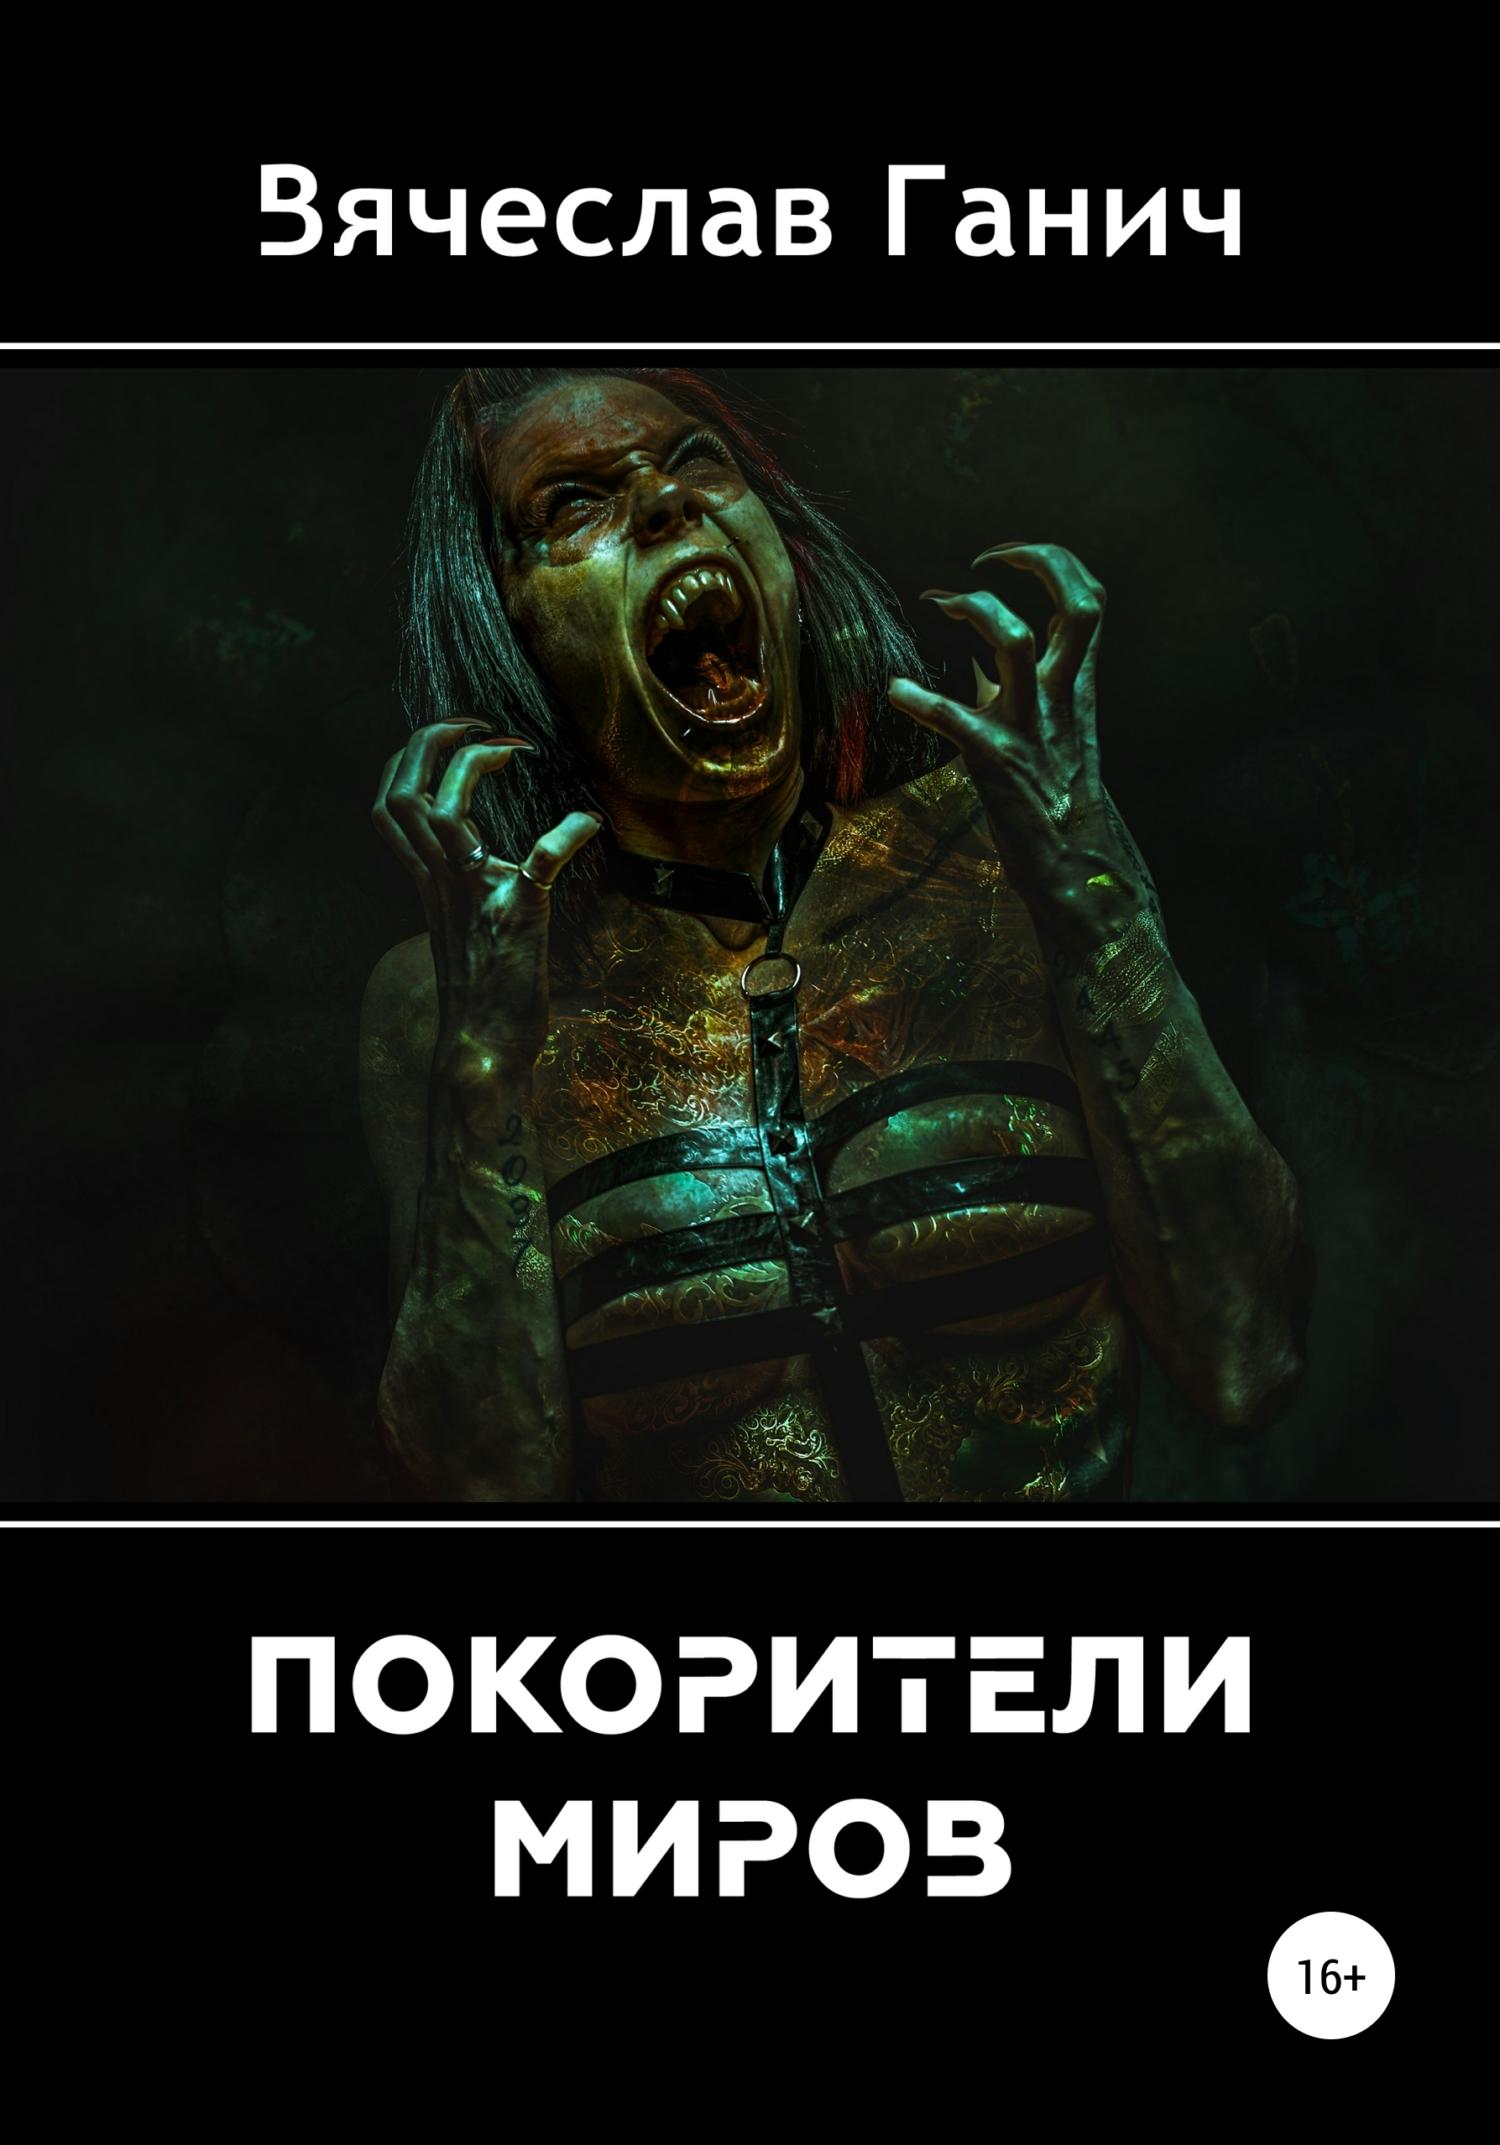 Вячеслав Ганич - Покорители миров